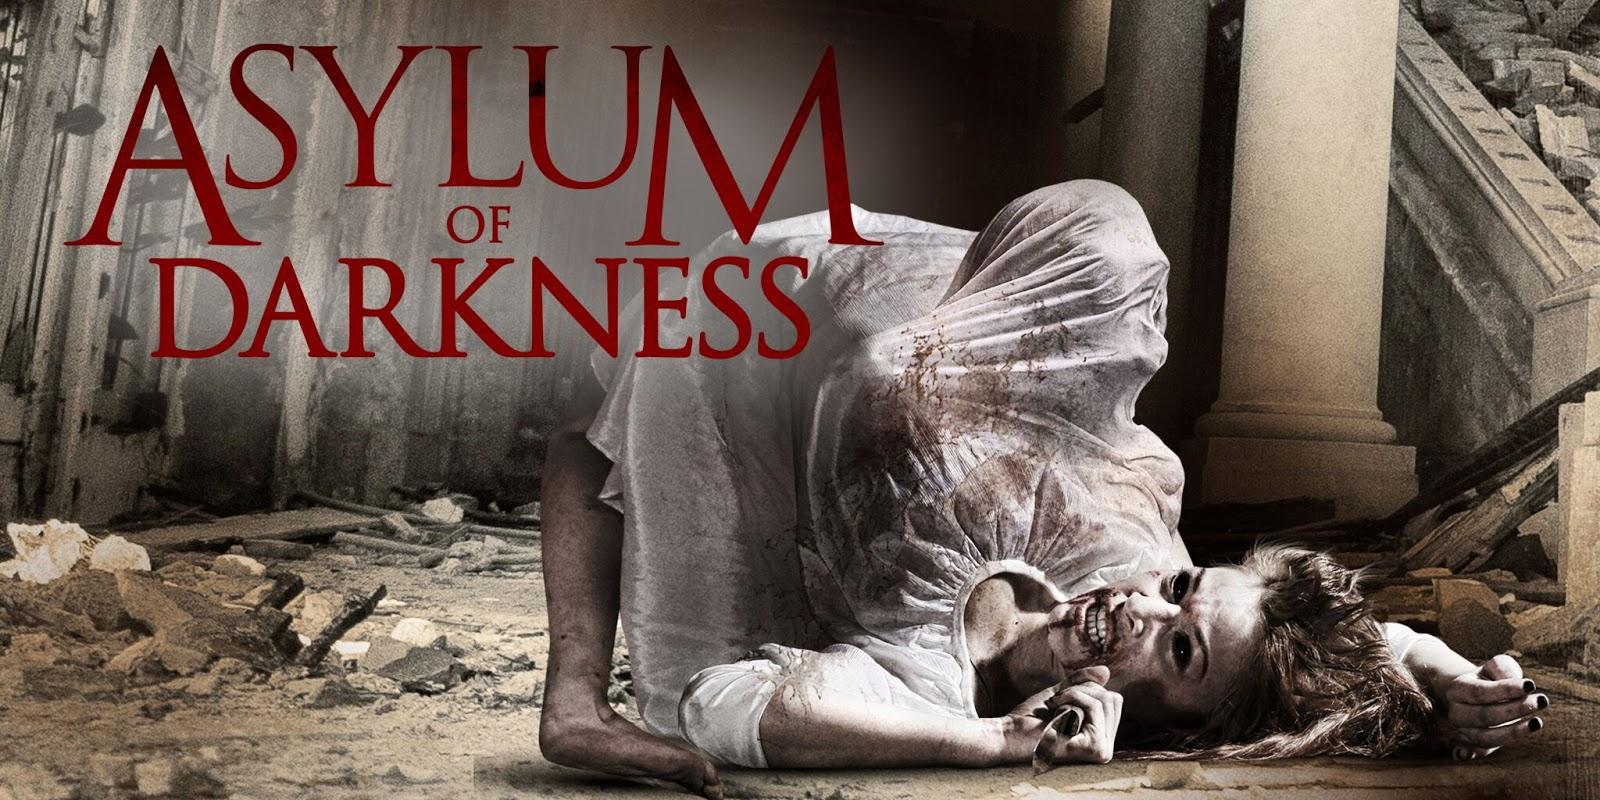 https://2.bp.blogspot.com/-Y6w4t4GGcQQ/WOq9g_9q_jI/AAAAAAAAAkw/HRvBiveDUH8zezLwu2hUREOVQUQAH_HqACLcB/s1600/asylumOfDarkness.jpg Asylum